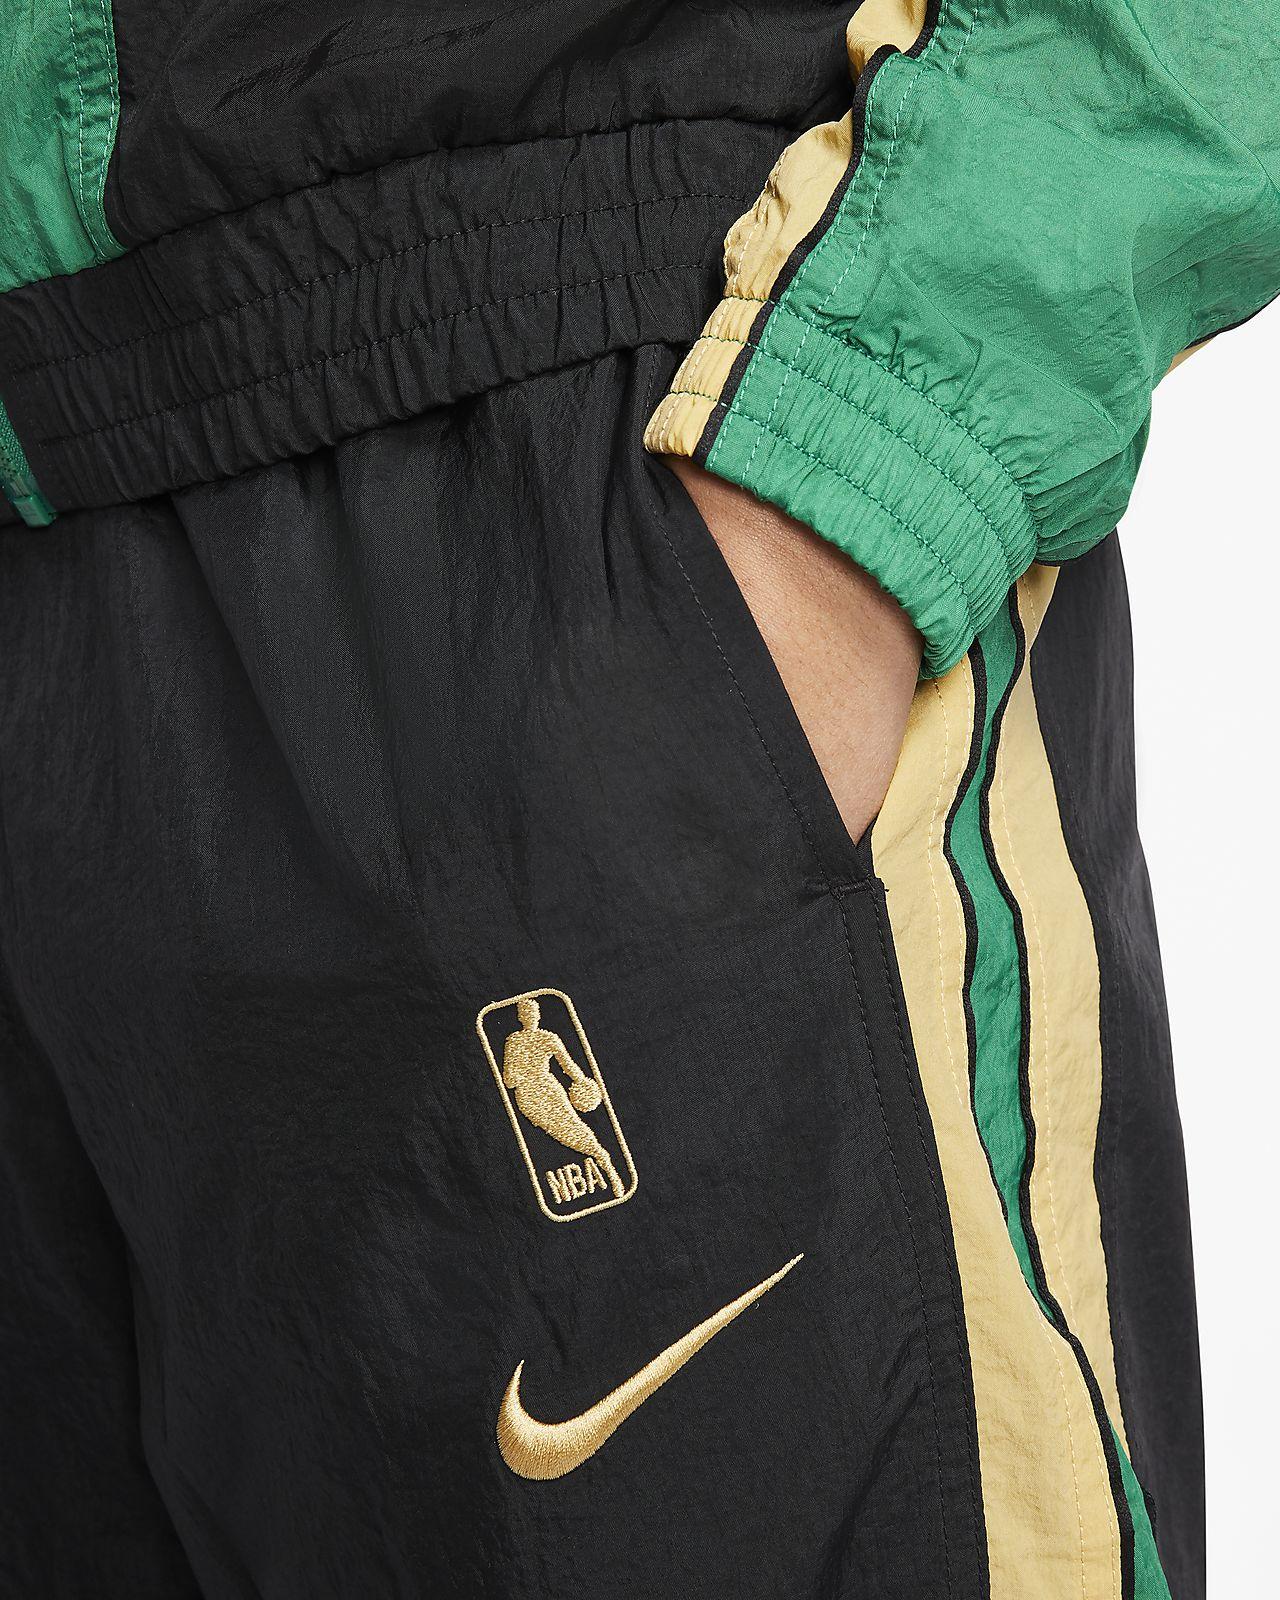 Celtics Courtside City Edition Nike NBA Trainingsanzug für Herren